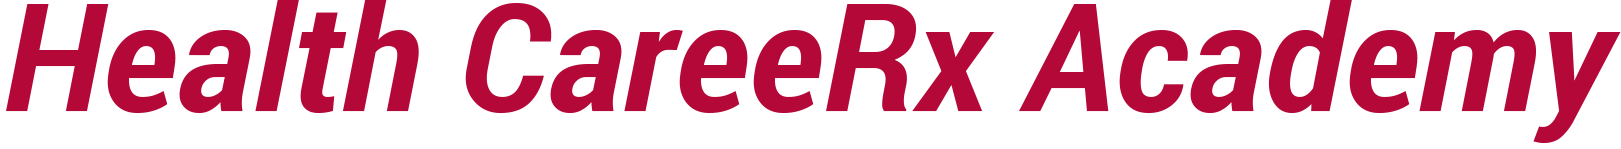 Health CareeRx Academy Logo